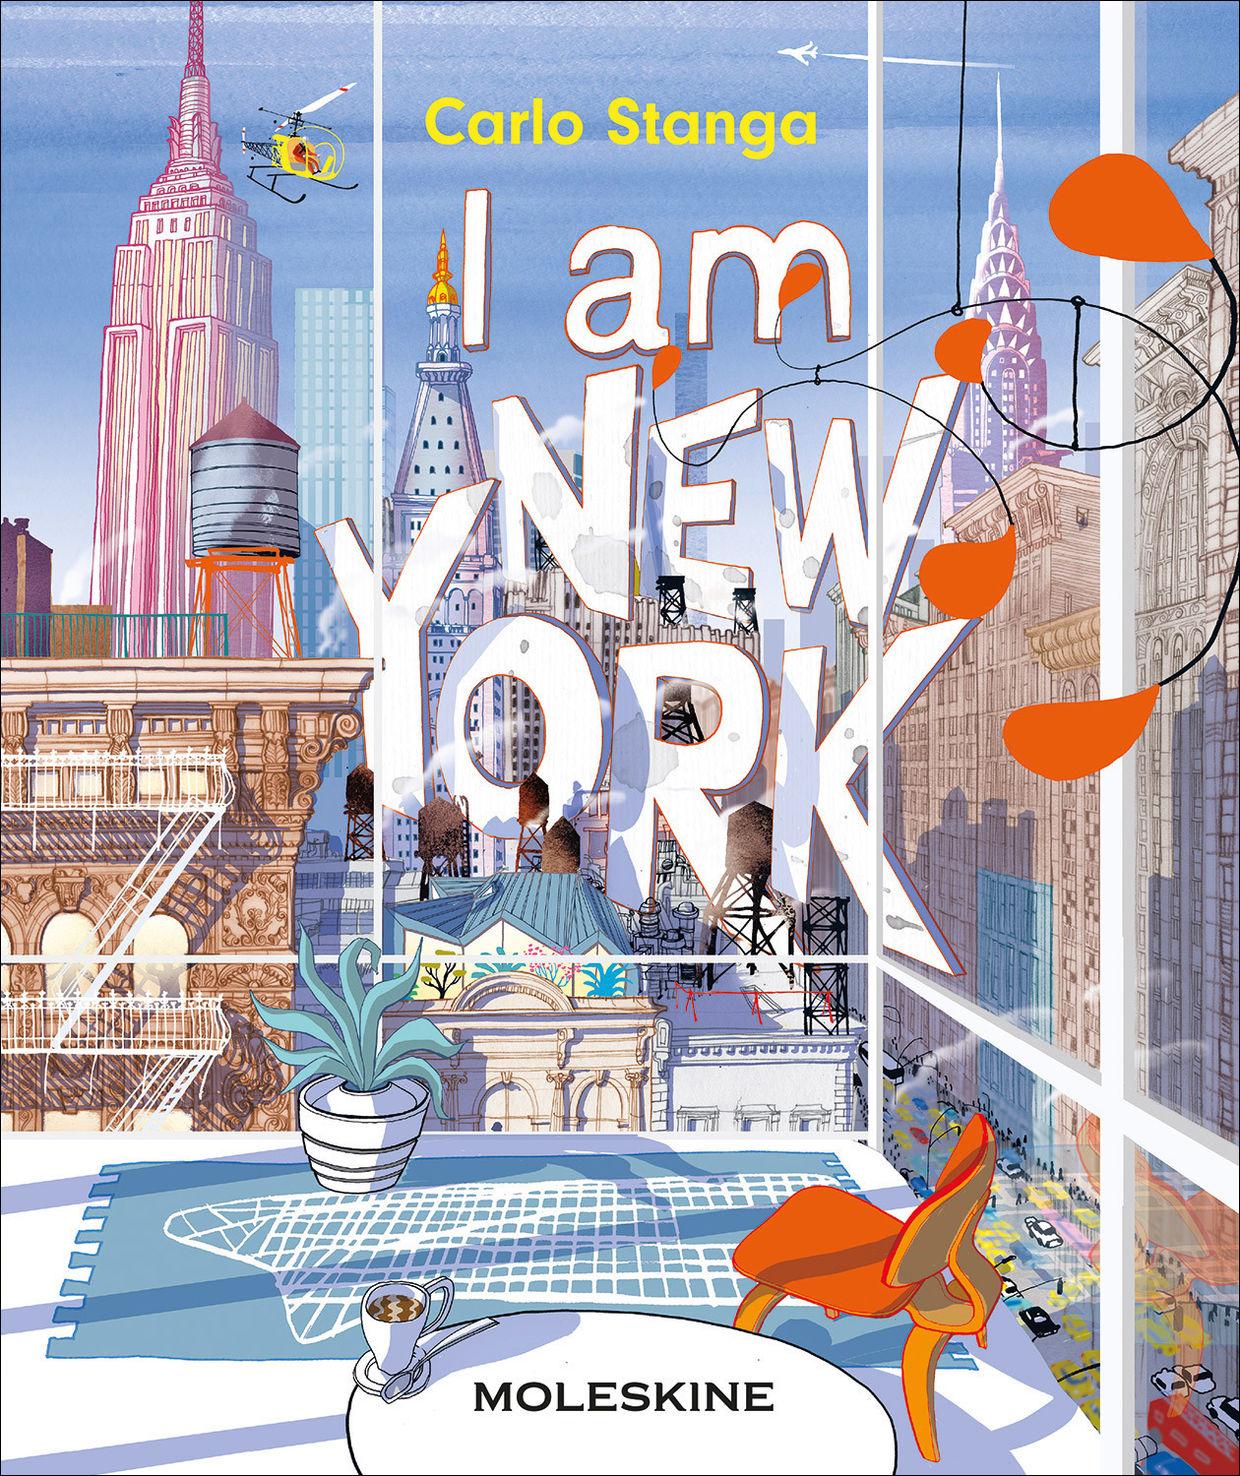 'I AM NEW YORK' by Carlo Stanga c/o 2AGENTEN (MOLESKINE, PICTURE BOOK)